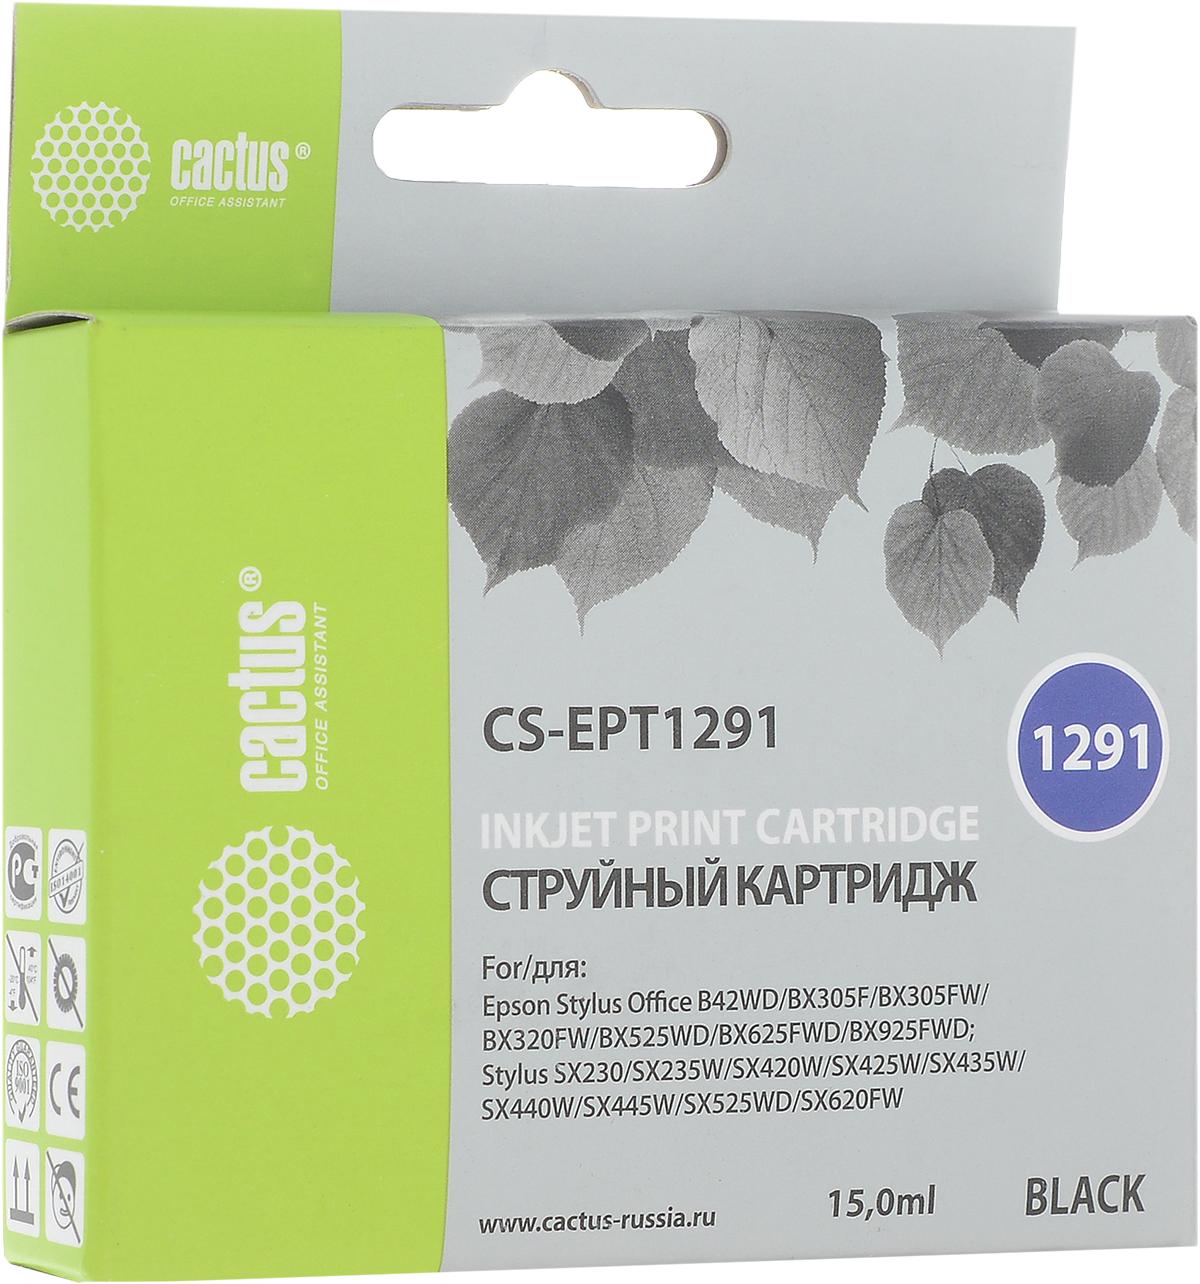 Cactus CS-EPT1291, Black струйный картридж для Epson Stylus Office B42/BX305/BX305F/BX320 комплект перезаправляемых картриджей cactus cs r ept1295 для epson stylus office b42 bx305 bx305f